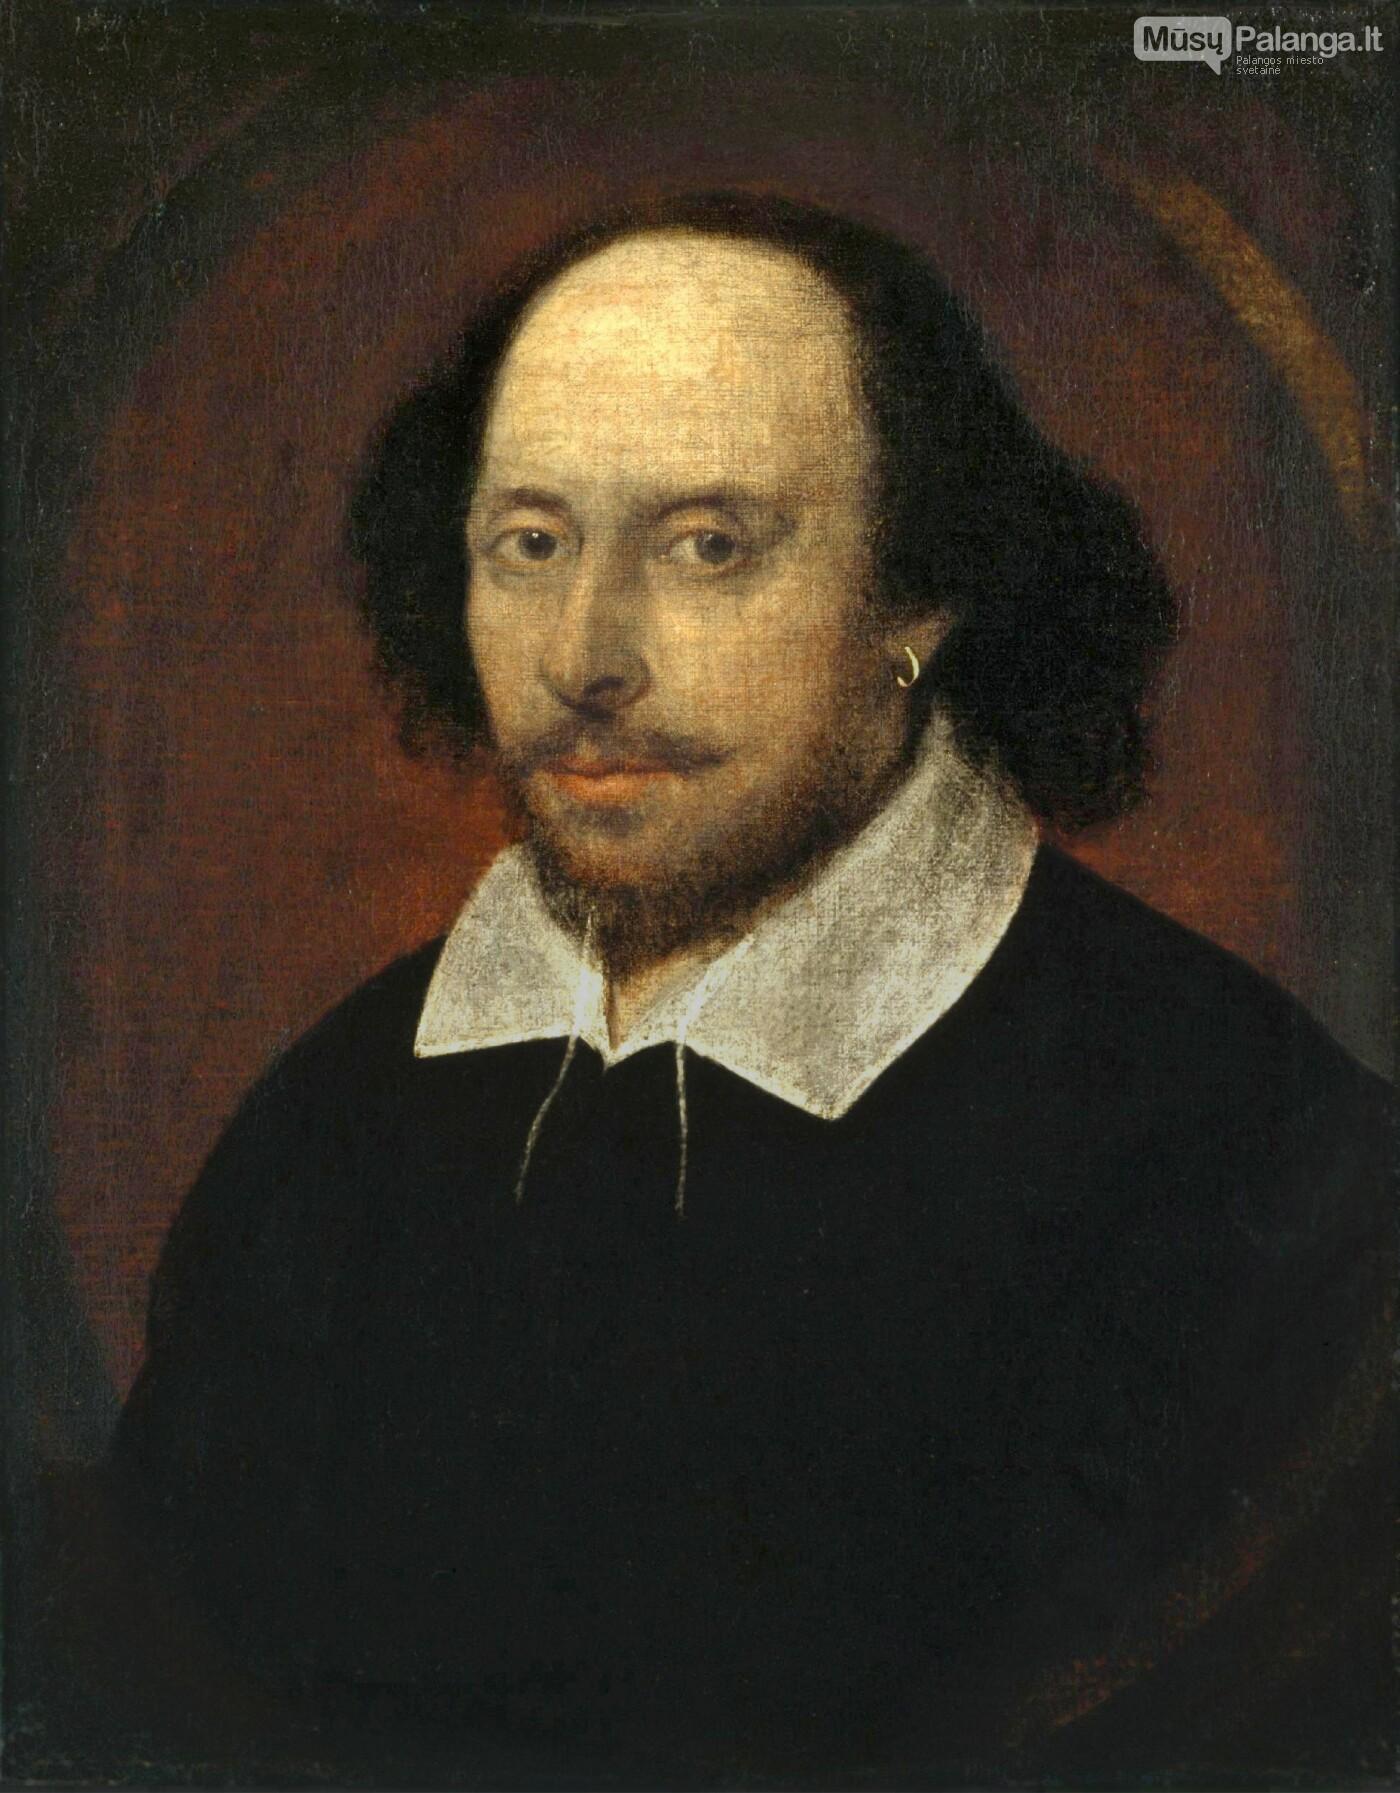 W. Shakespeare. Vikipedijos nuotr.